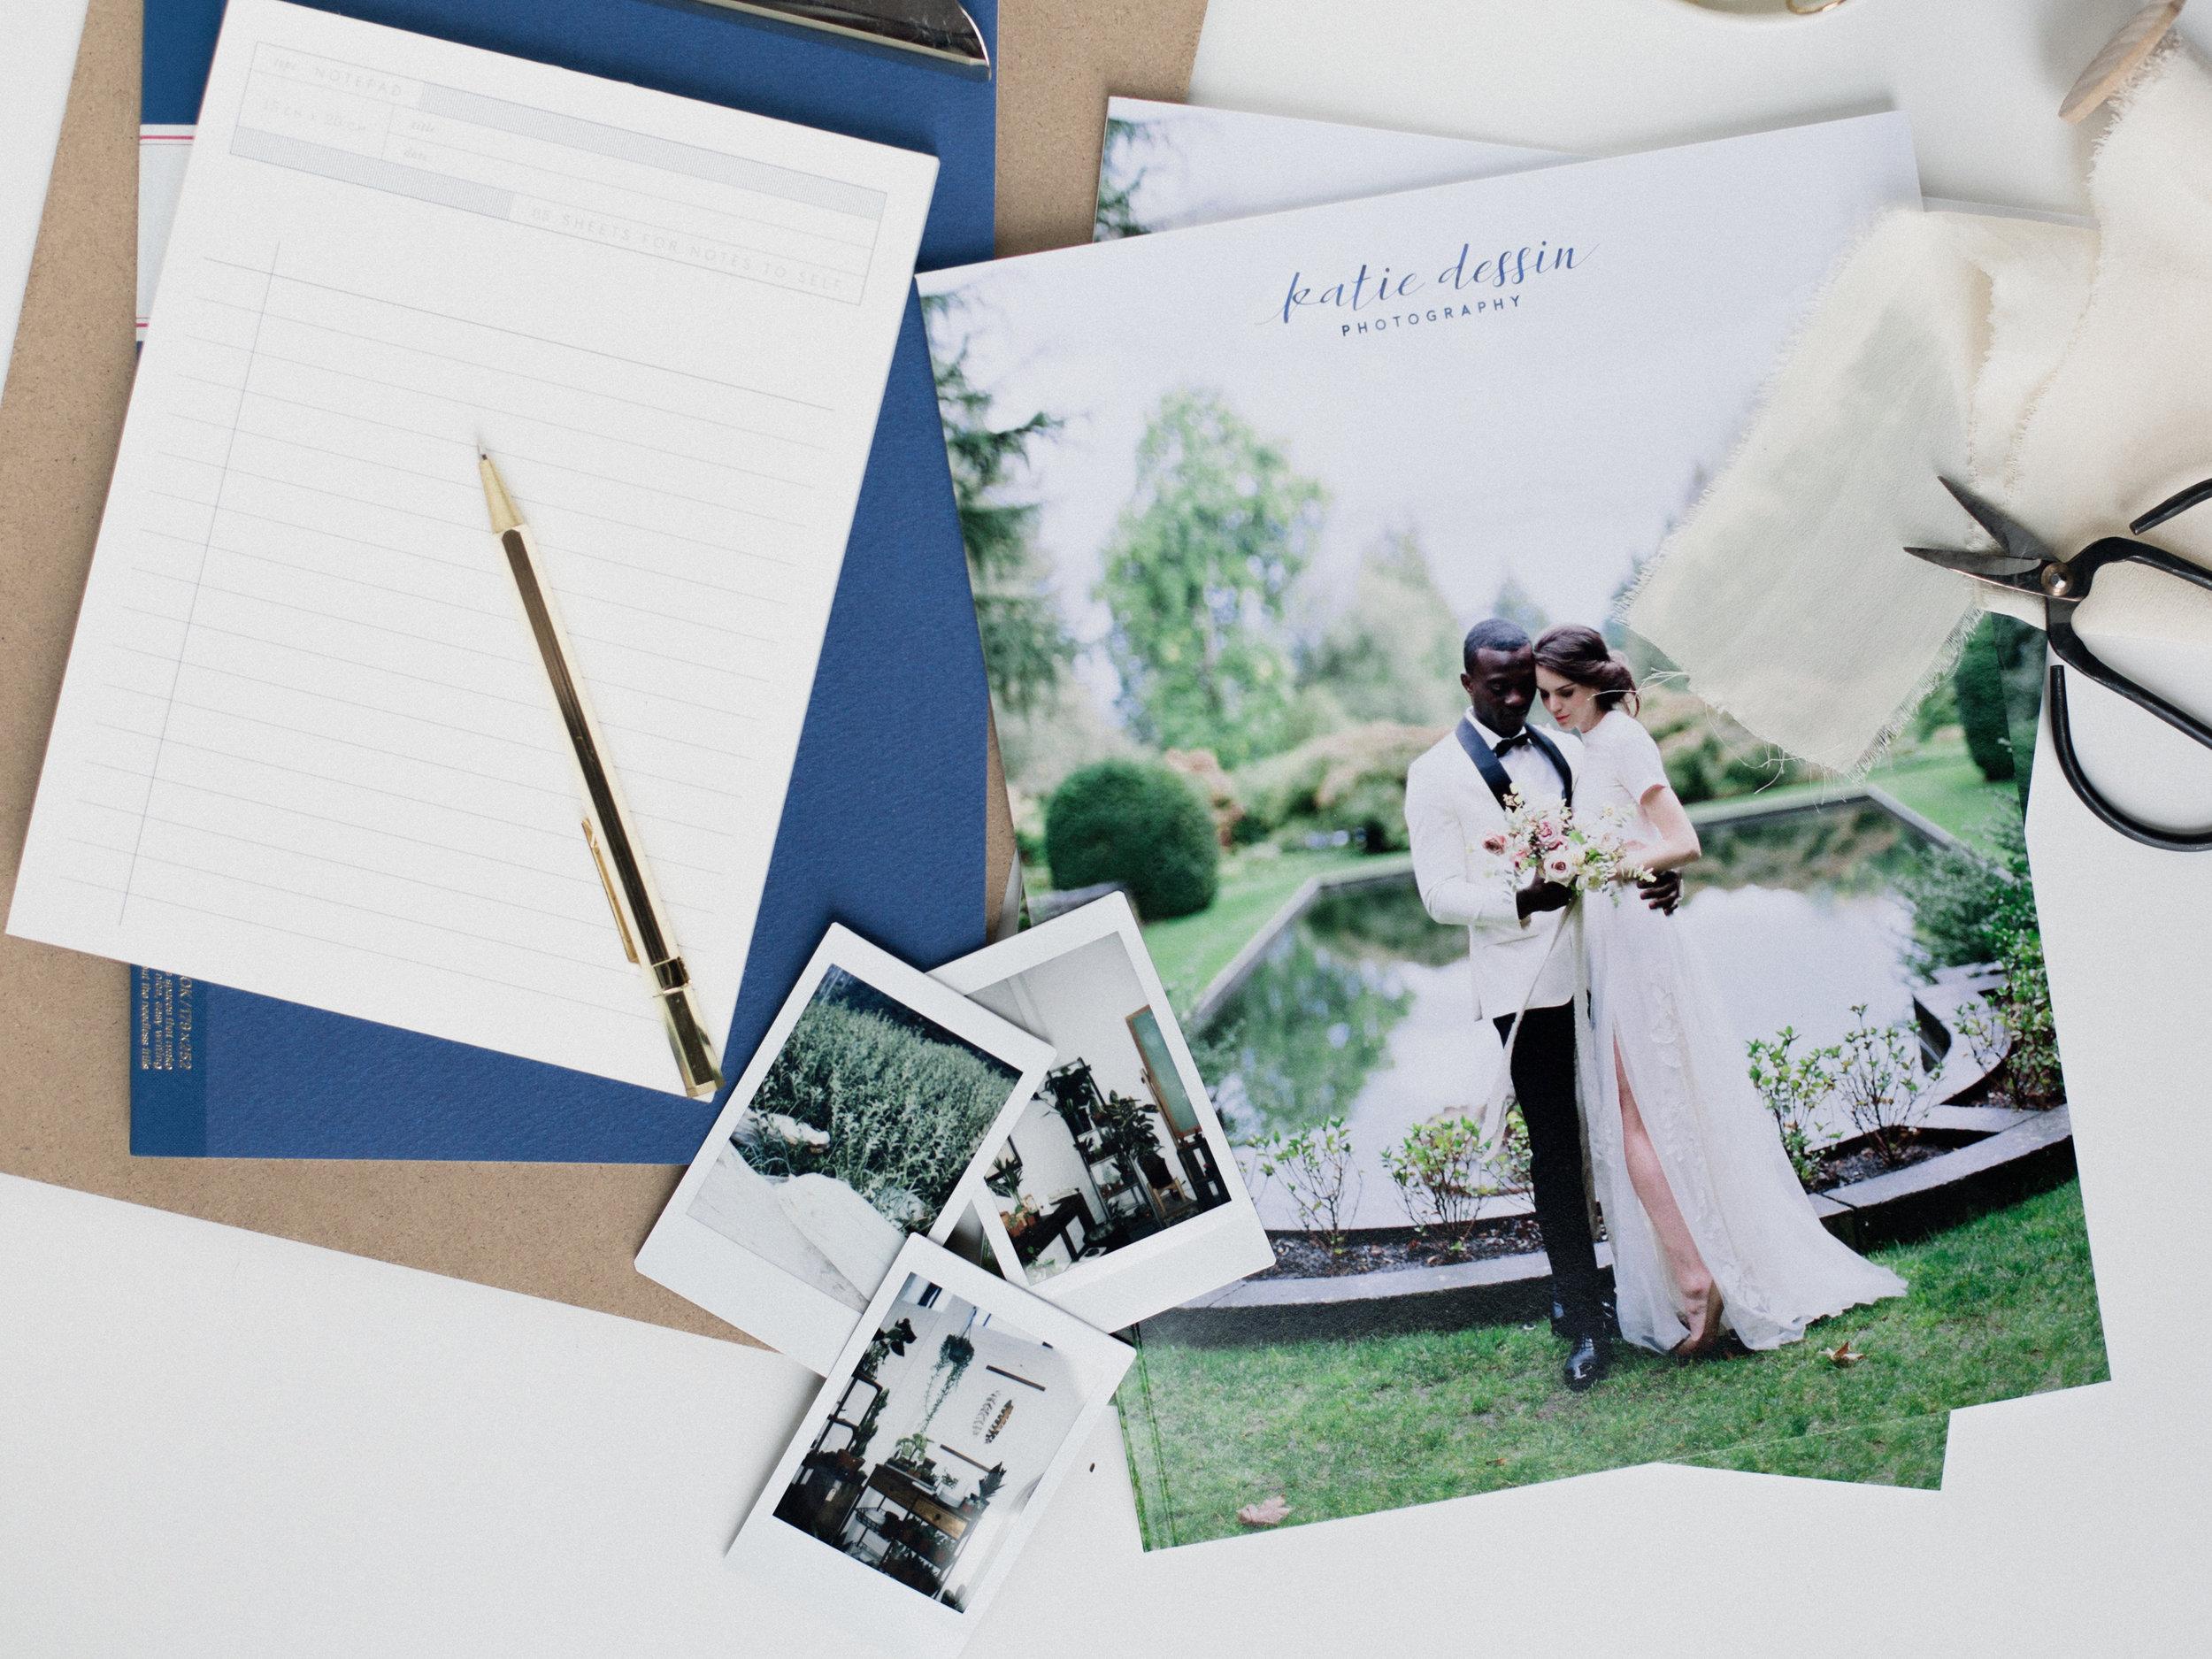 katie-dessin-portland-oregon-wedding-engagement-film-fine-art-photographer-9.jpg